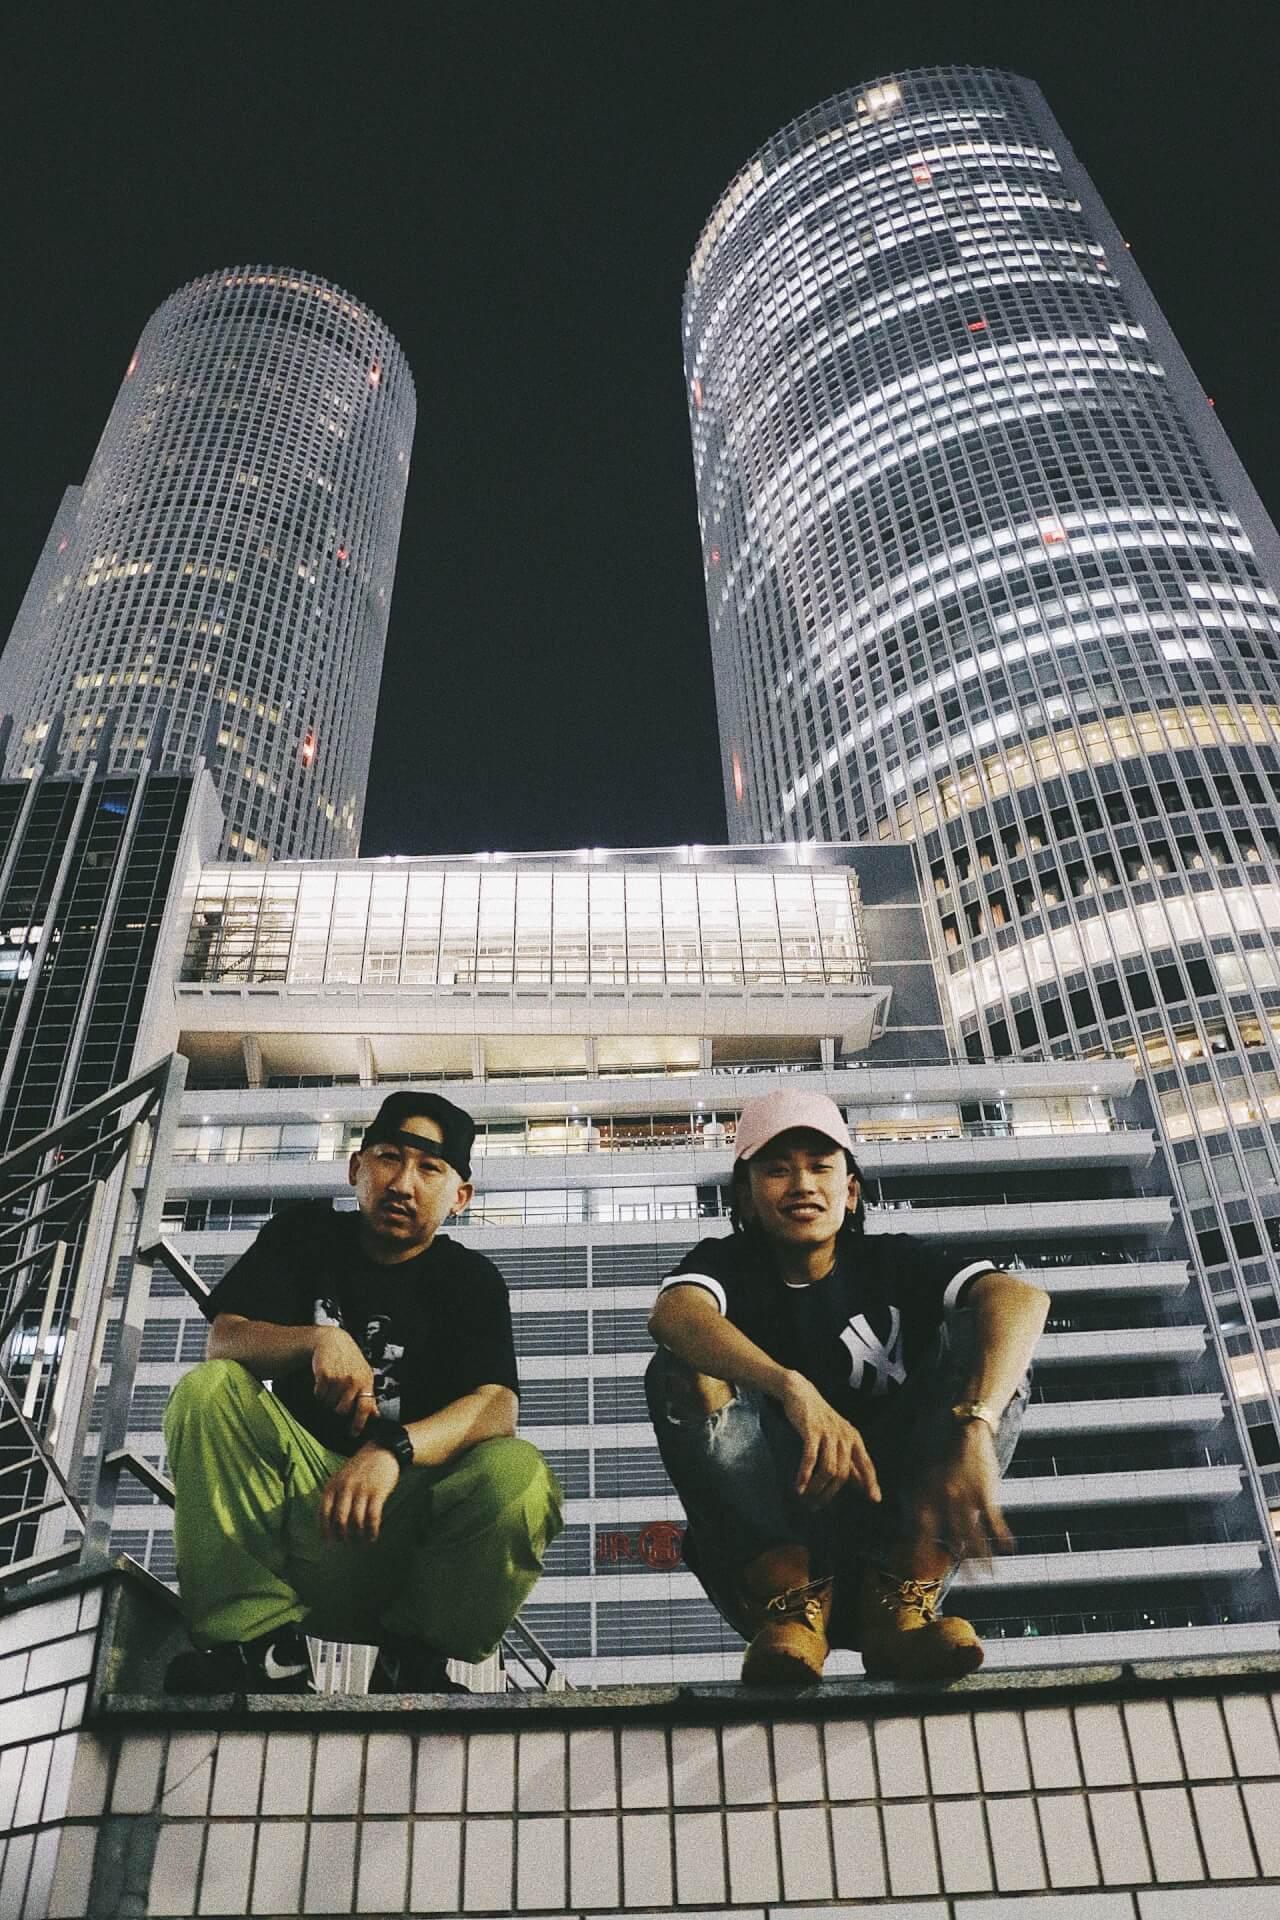 DJ RYOW新アルバムから「We Runnin feat. ¥ELLOW BUCKS」を先行配信|話題のMVも公開 music190904djryow_2